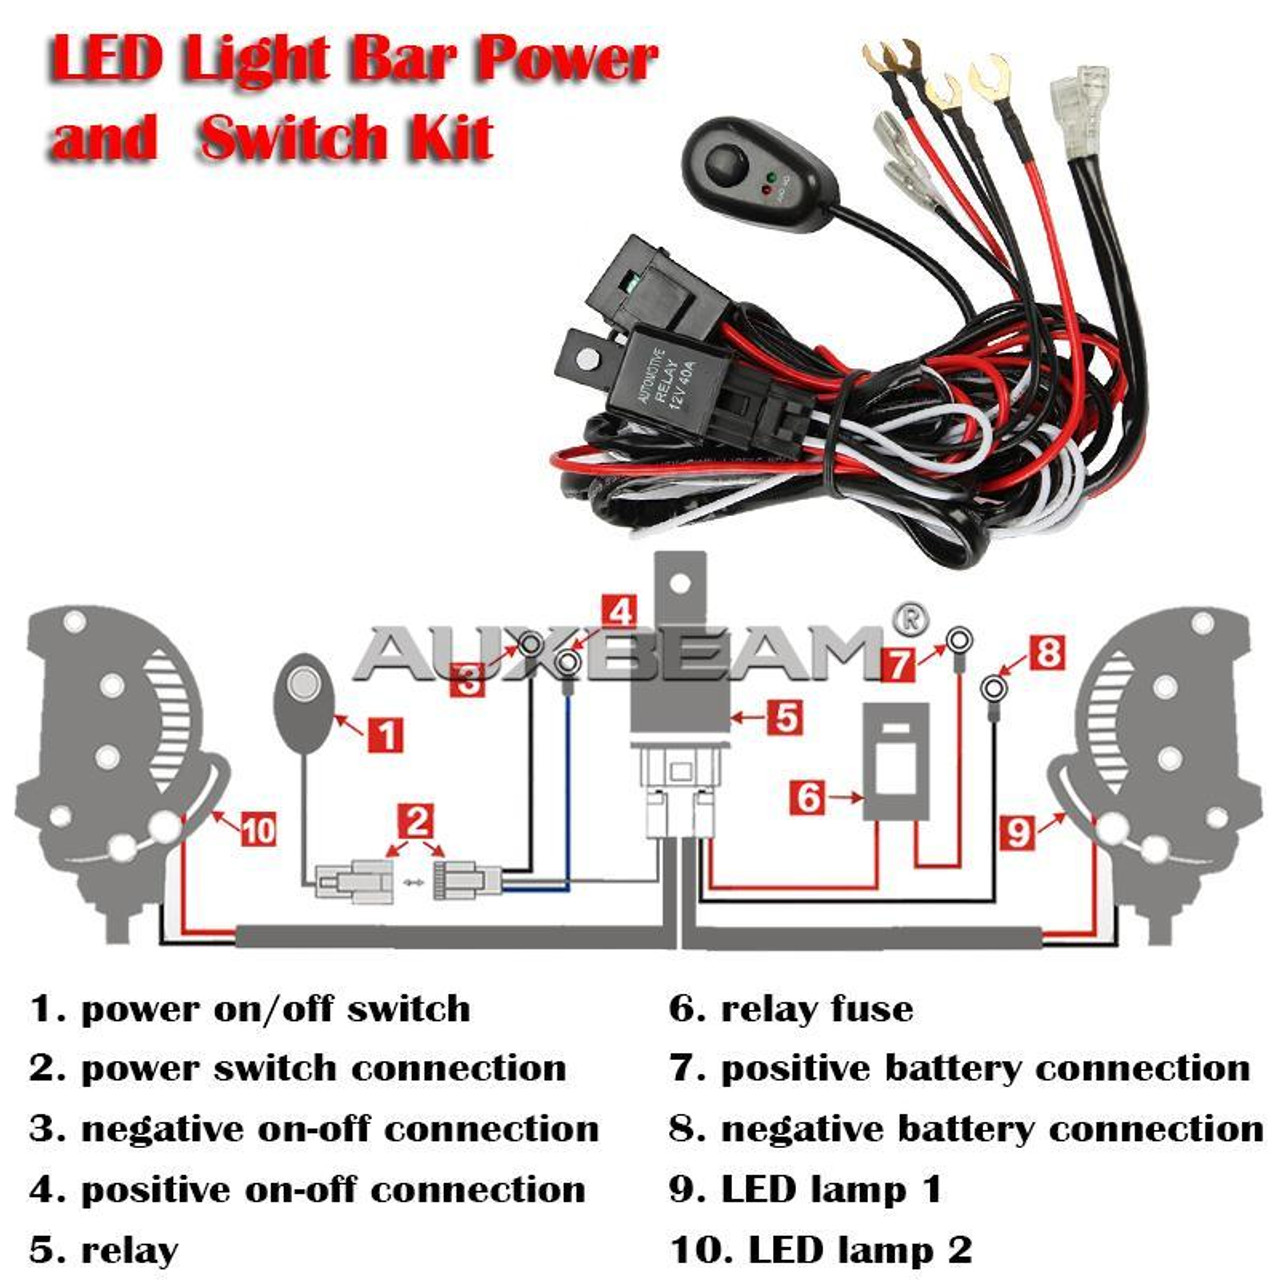 hight resolution of 12v 40a led light bar wiring harness kit dual lights 12v 40a led light bar